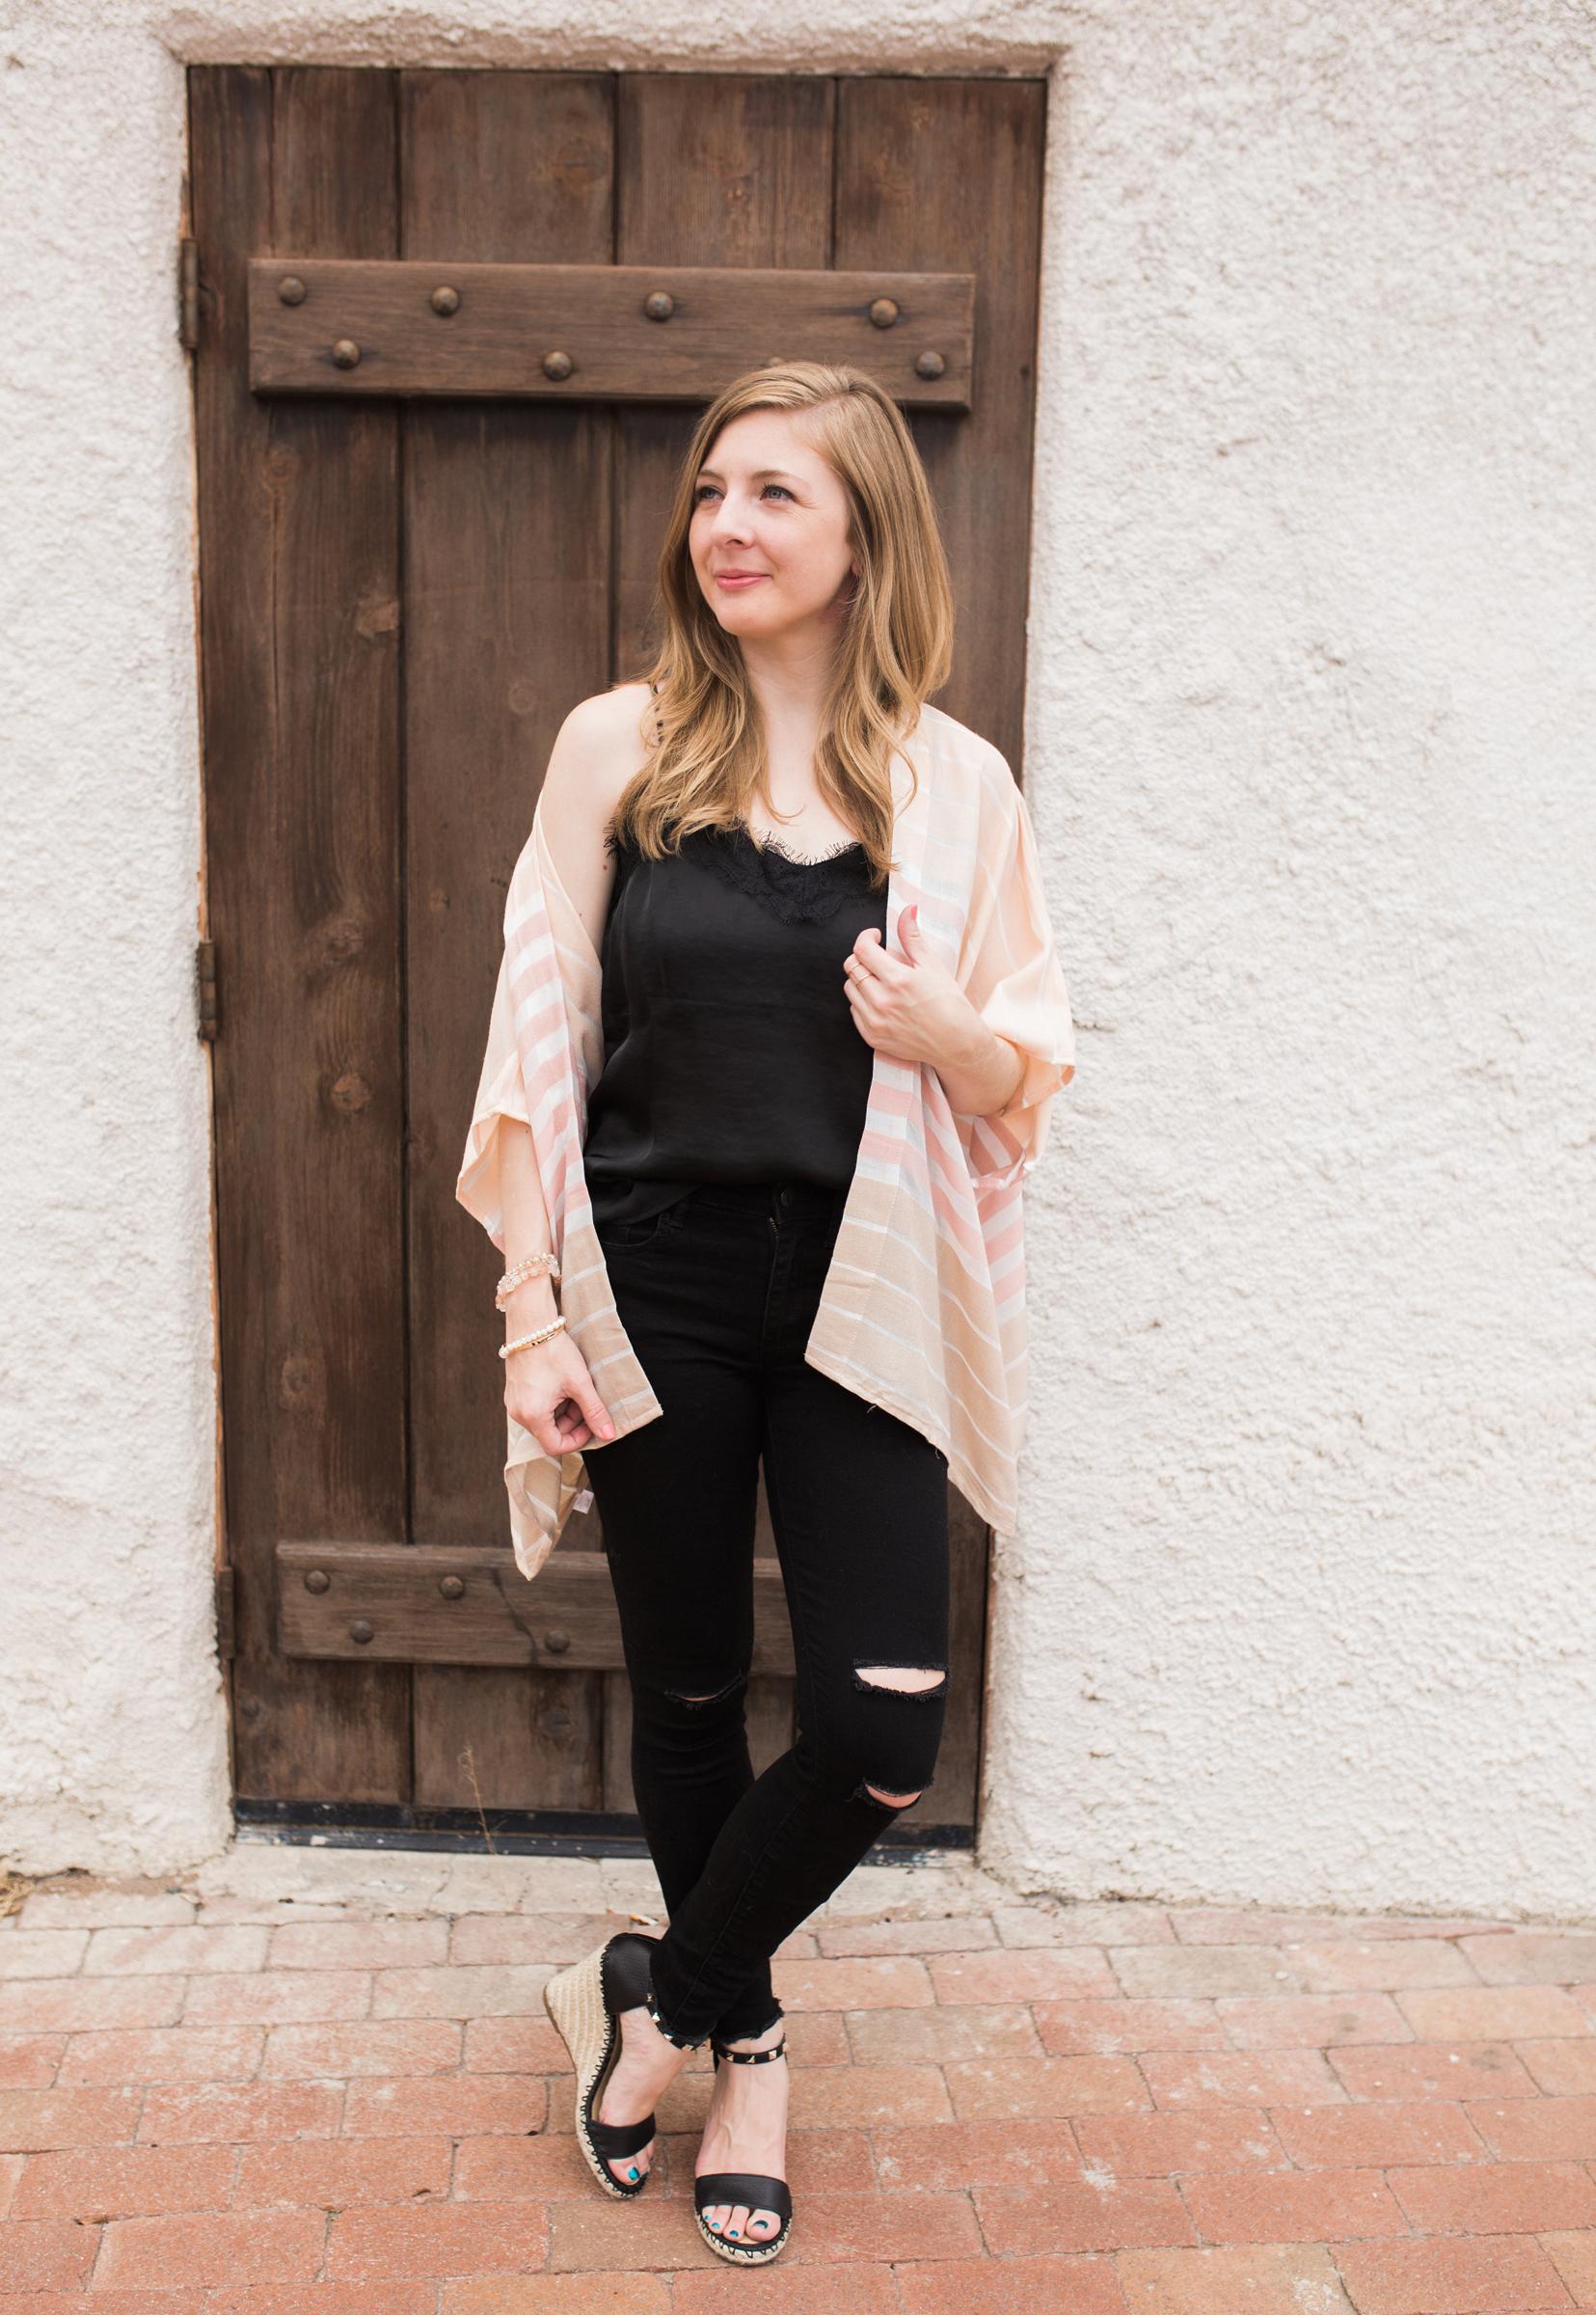 Pastel Kimono, black lace camisole, black distressed jeans